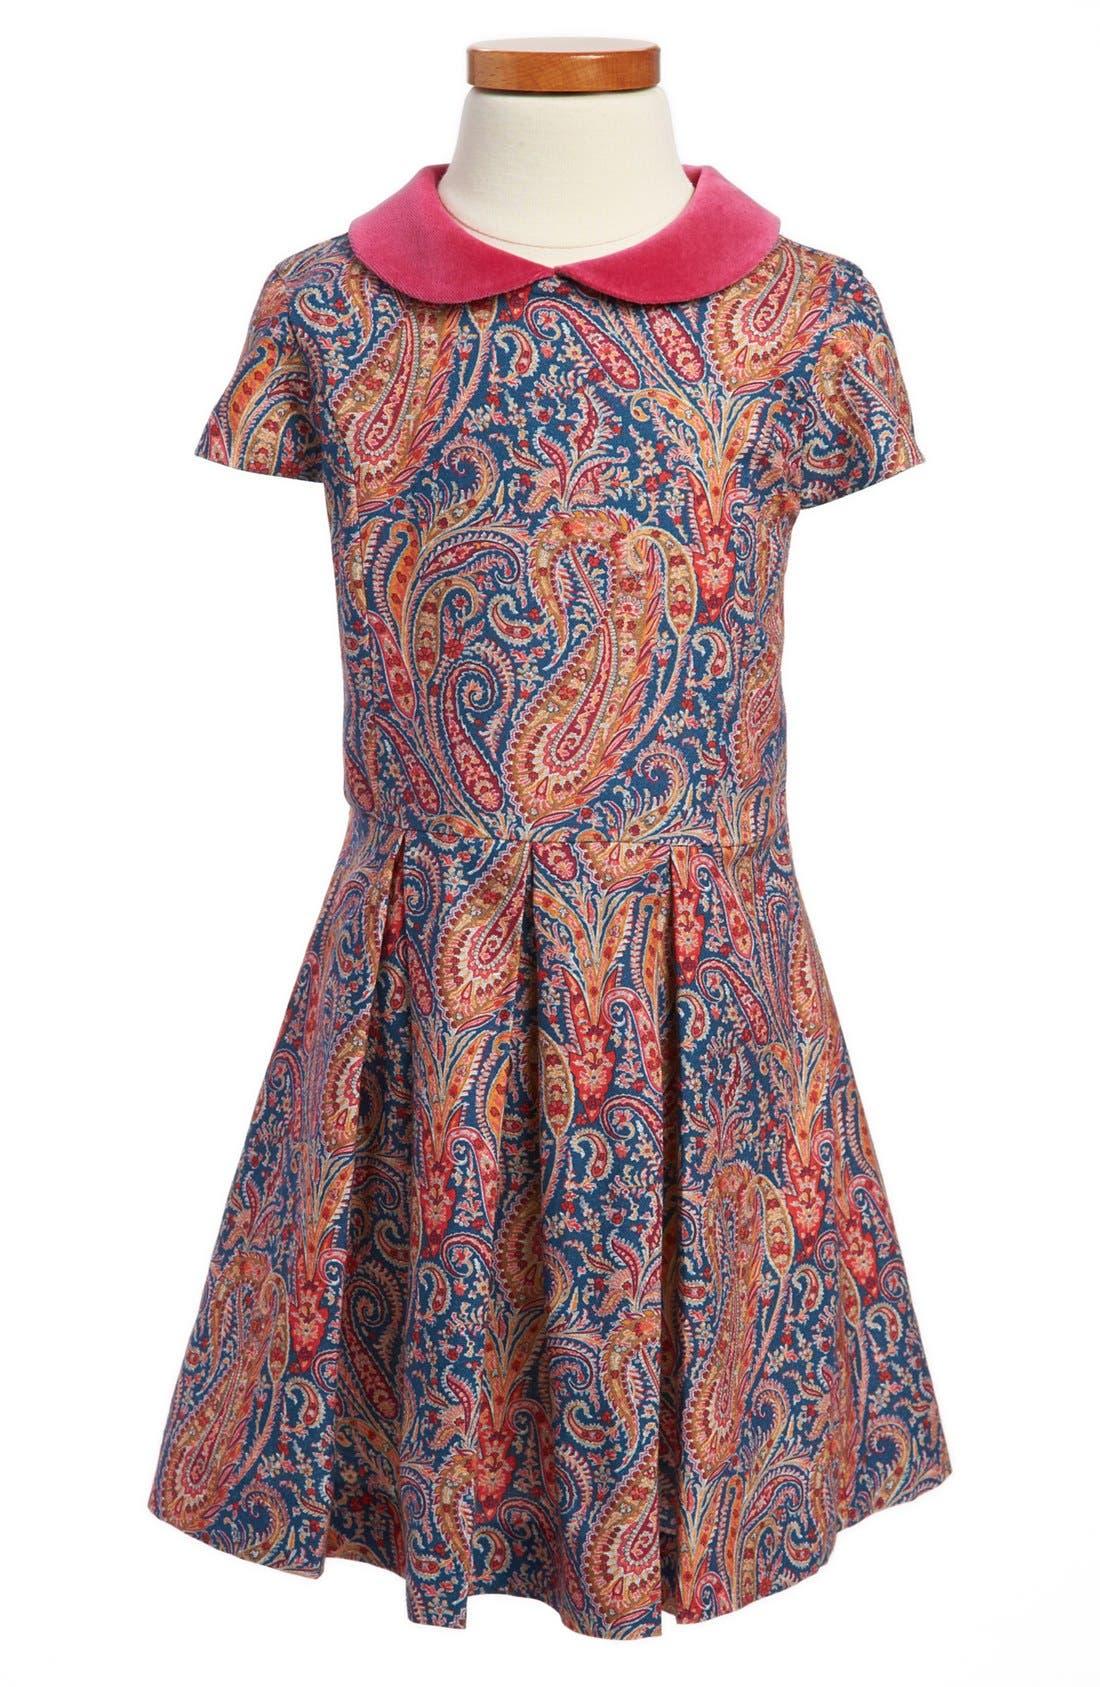 Alternate Image 1 Selected - Oscar de la Renta Cap Sleeve Party Dress (Toddler Girls, Little Girls & Big Girls)